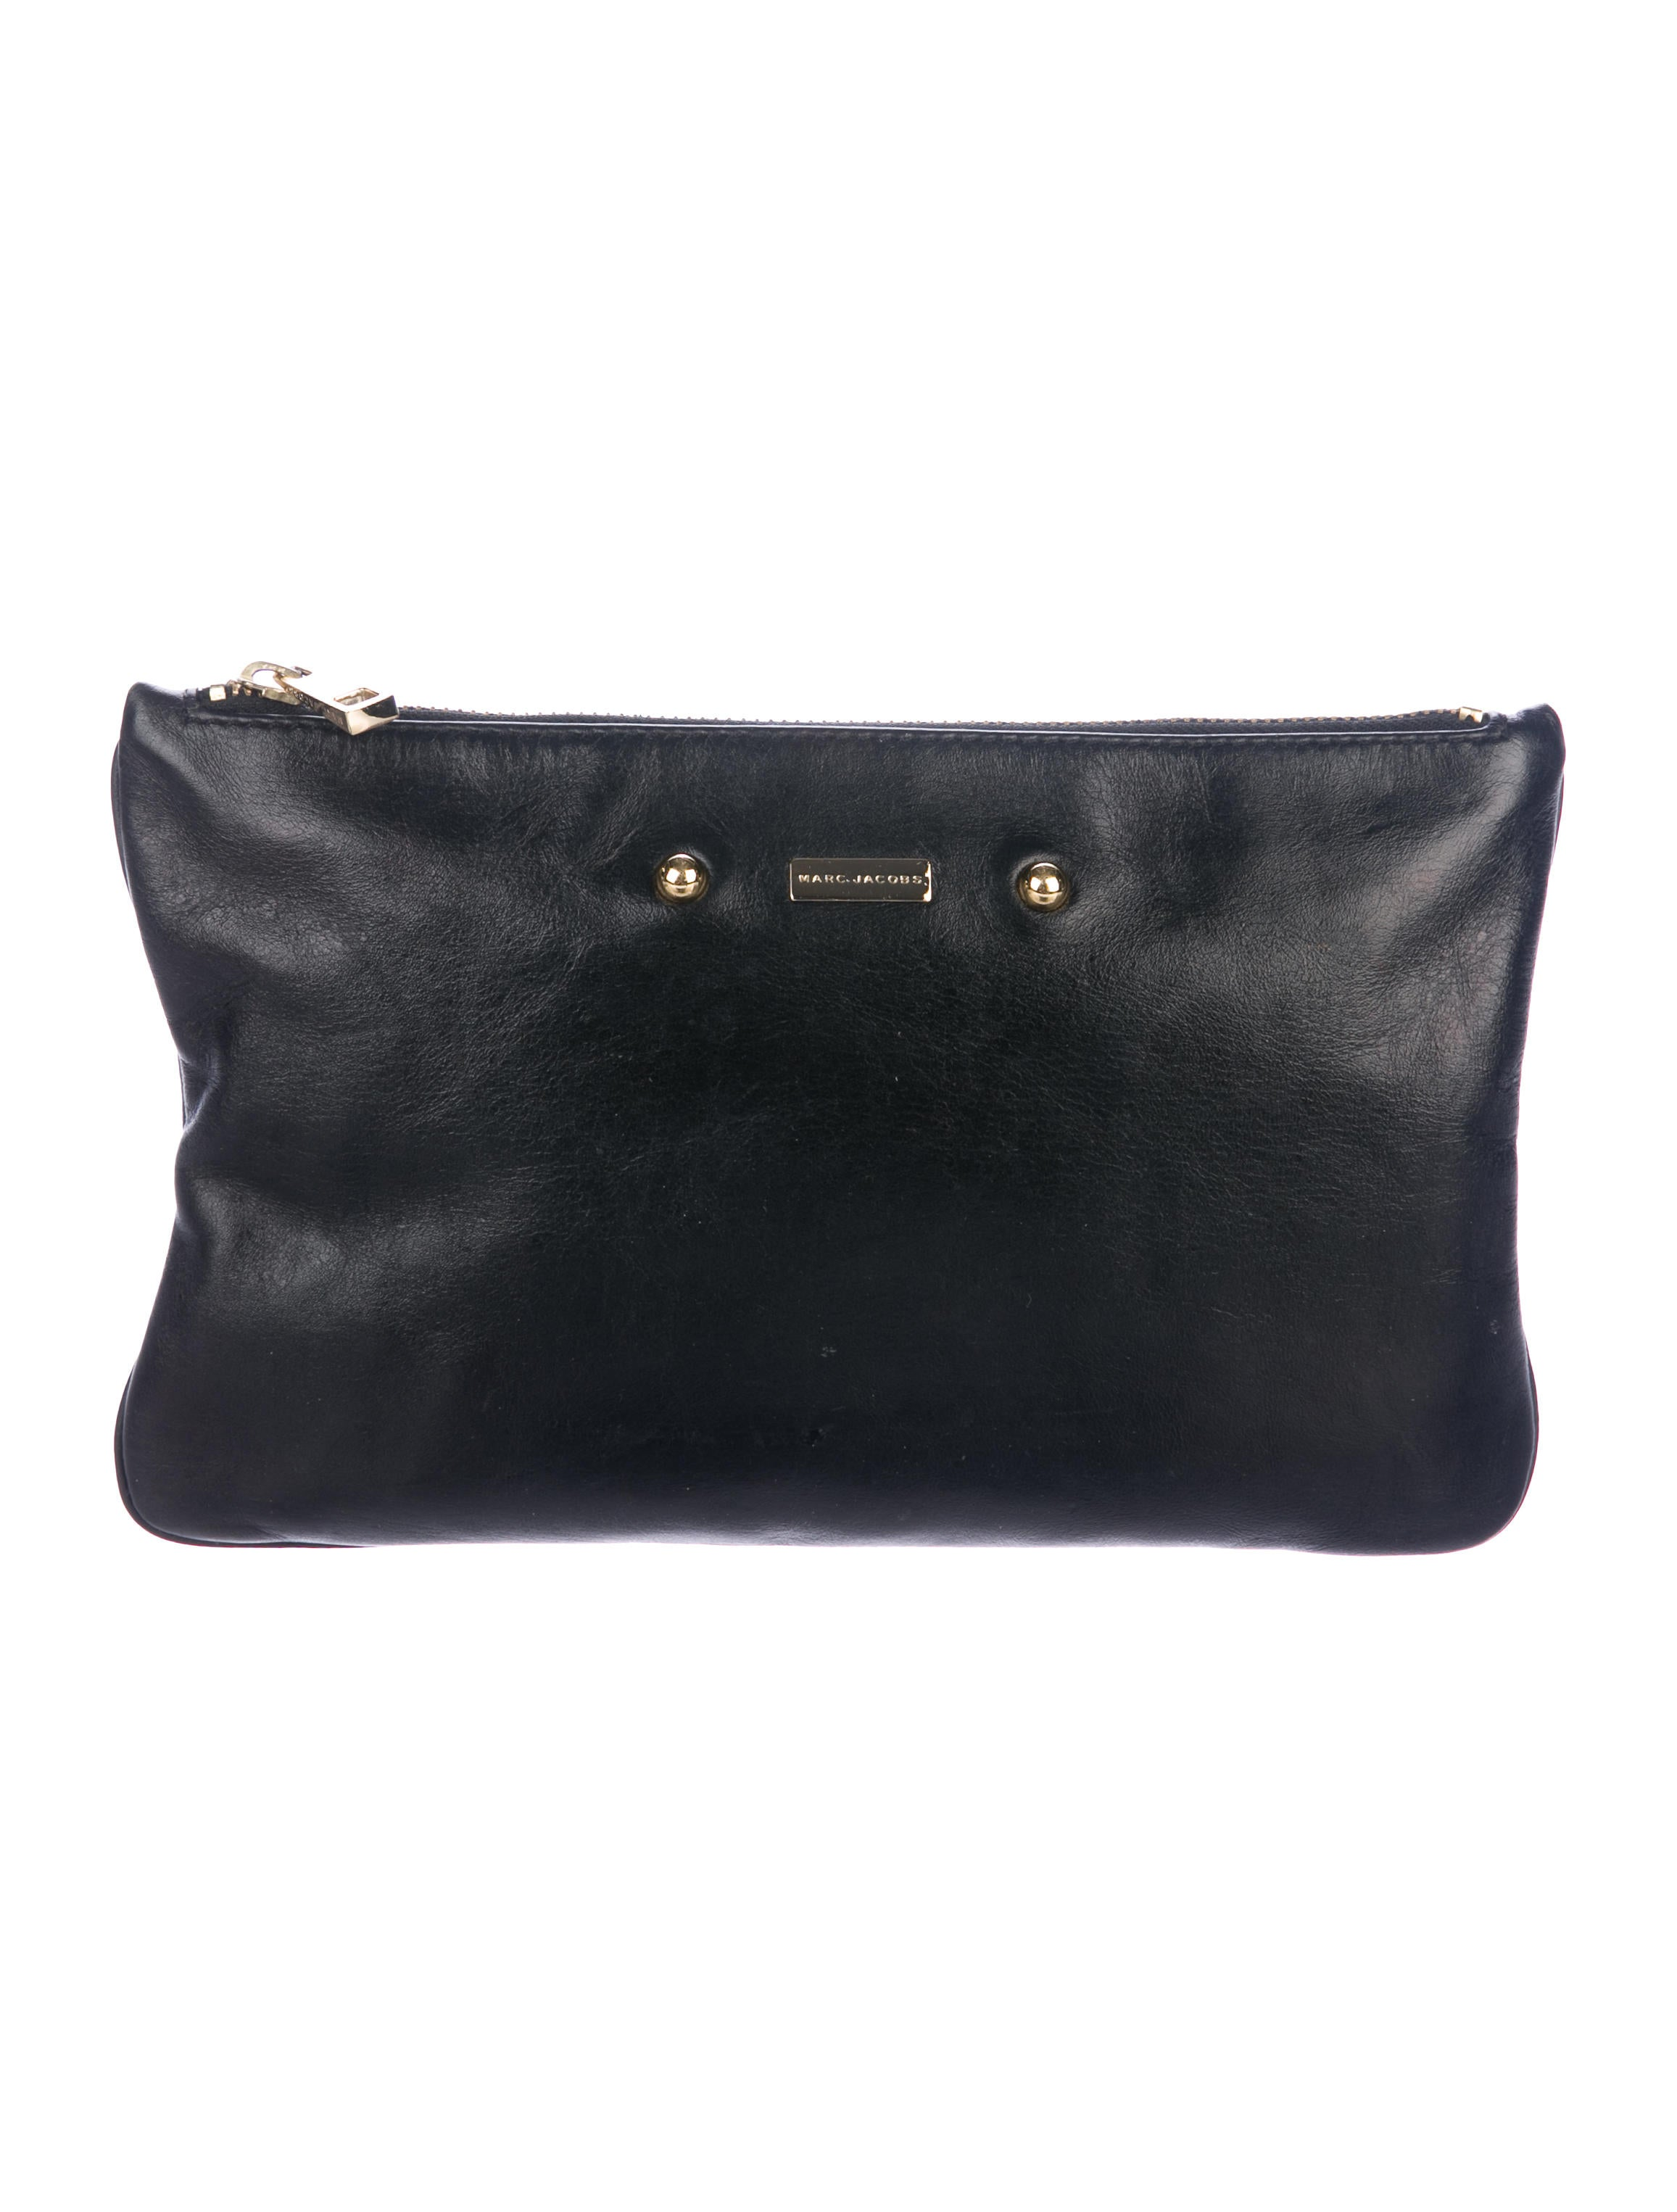 71d8150b2e2f Handbags